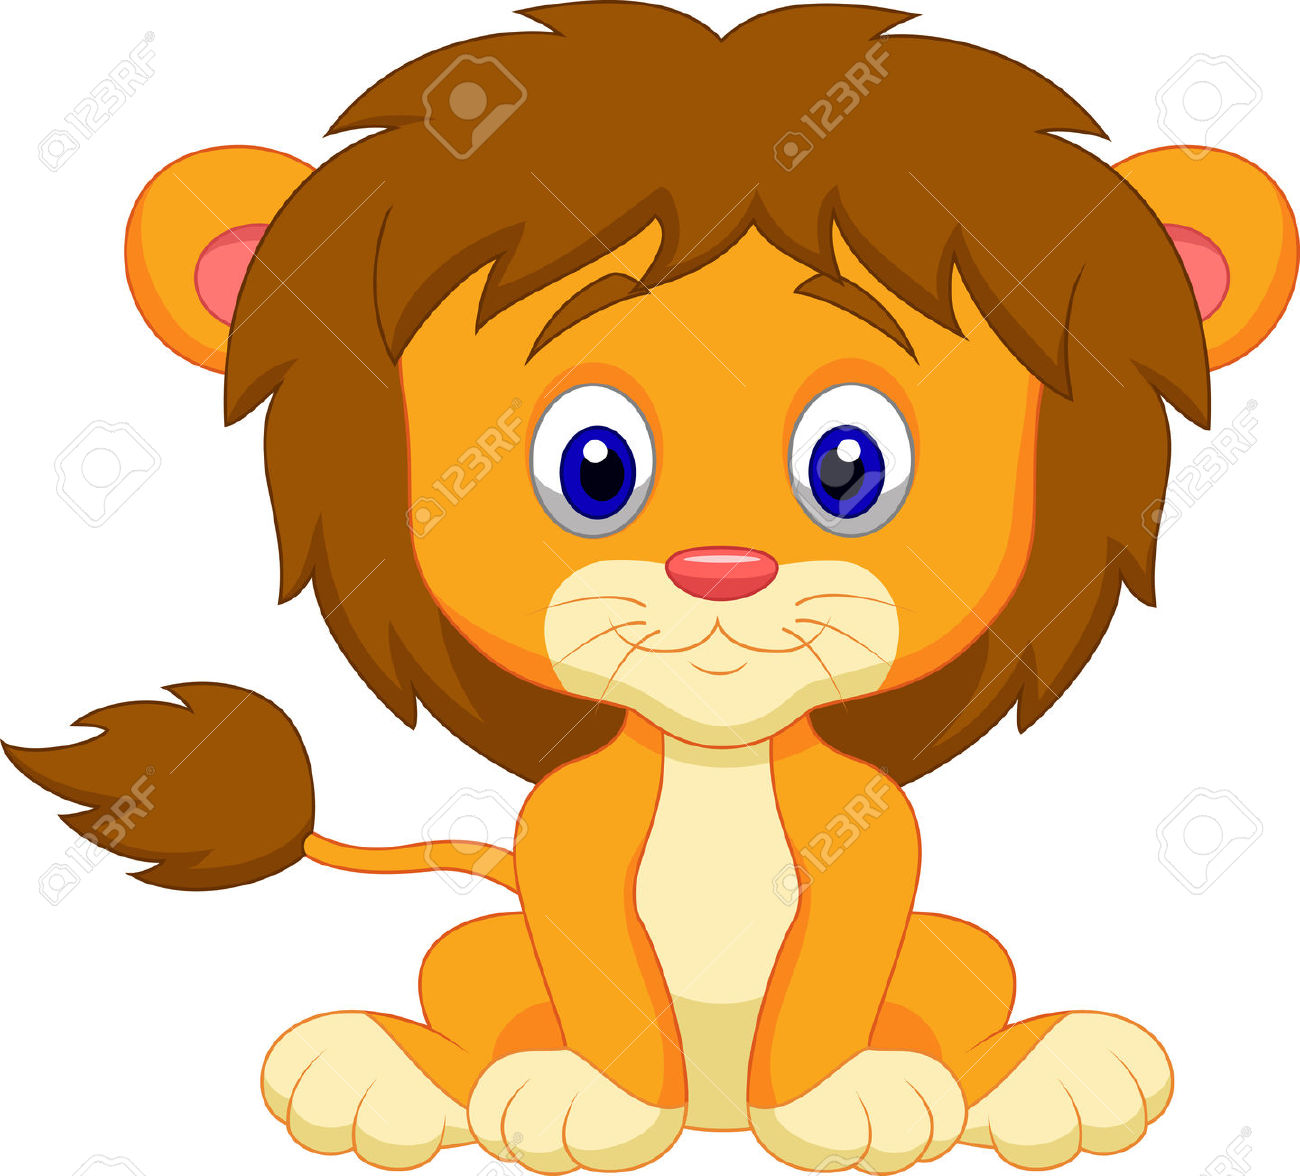 Animal clipart baby lion Lion animal clipart animal lion